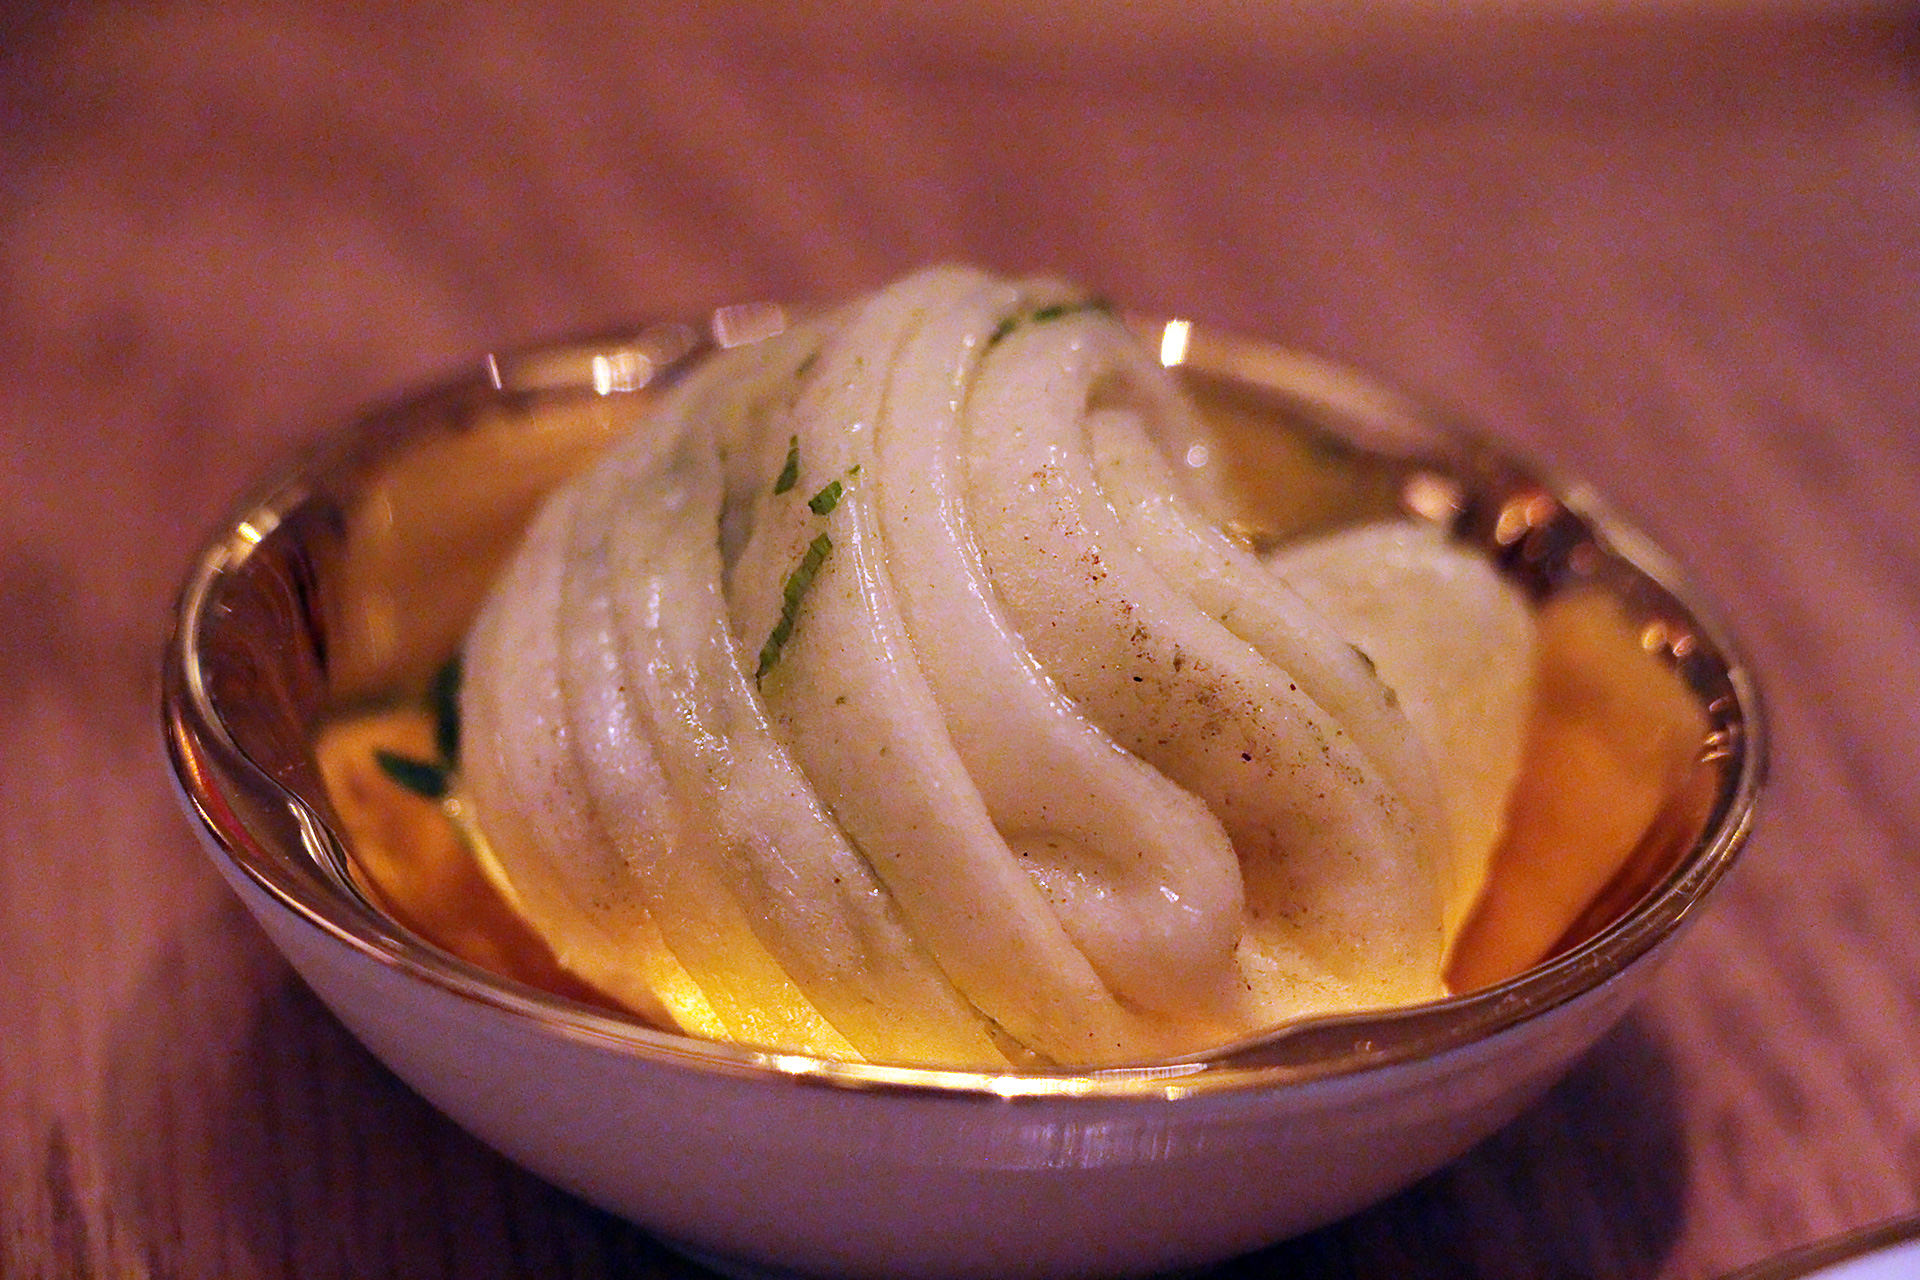 Handmade savory dumpling